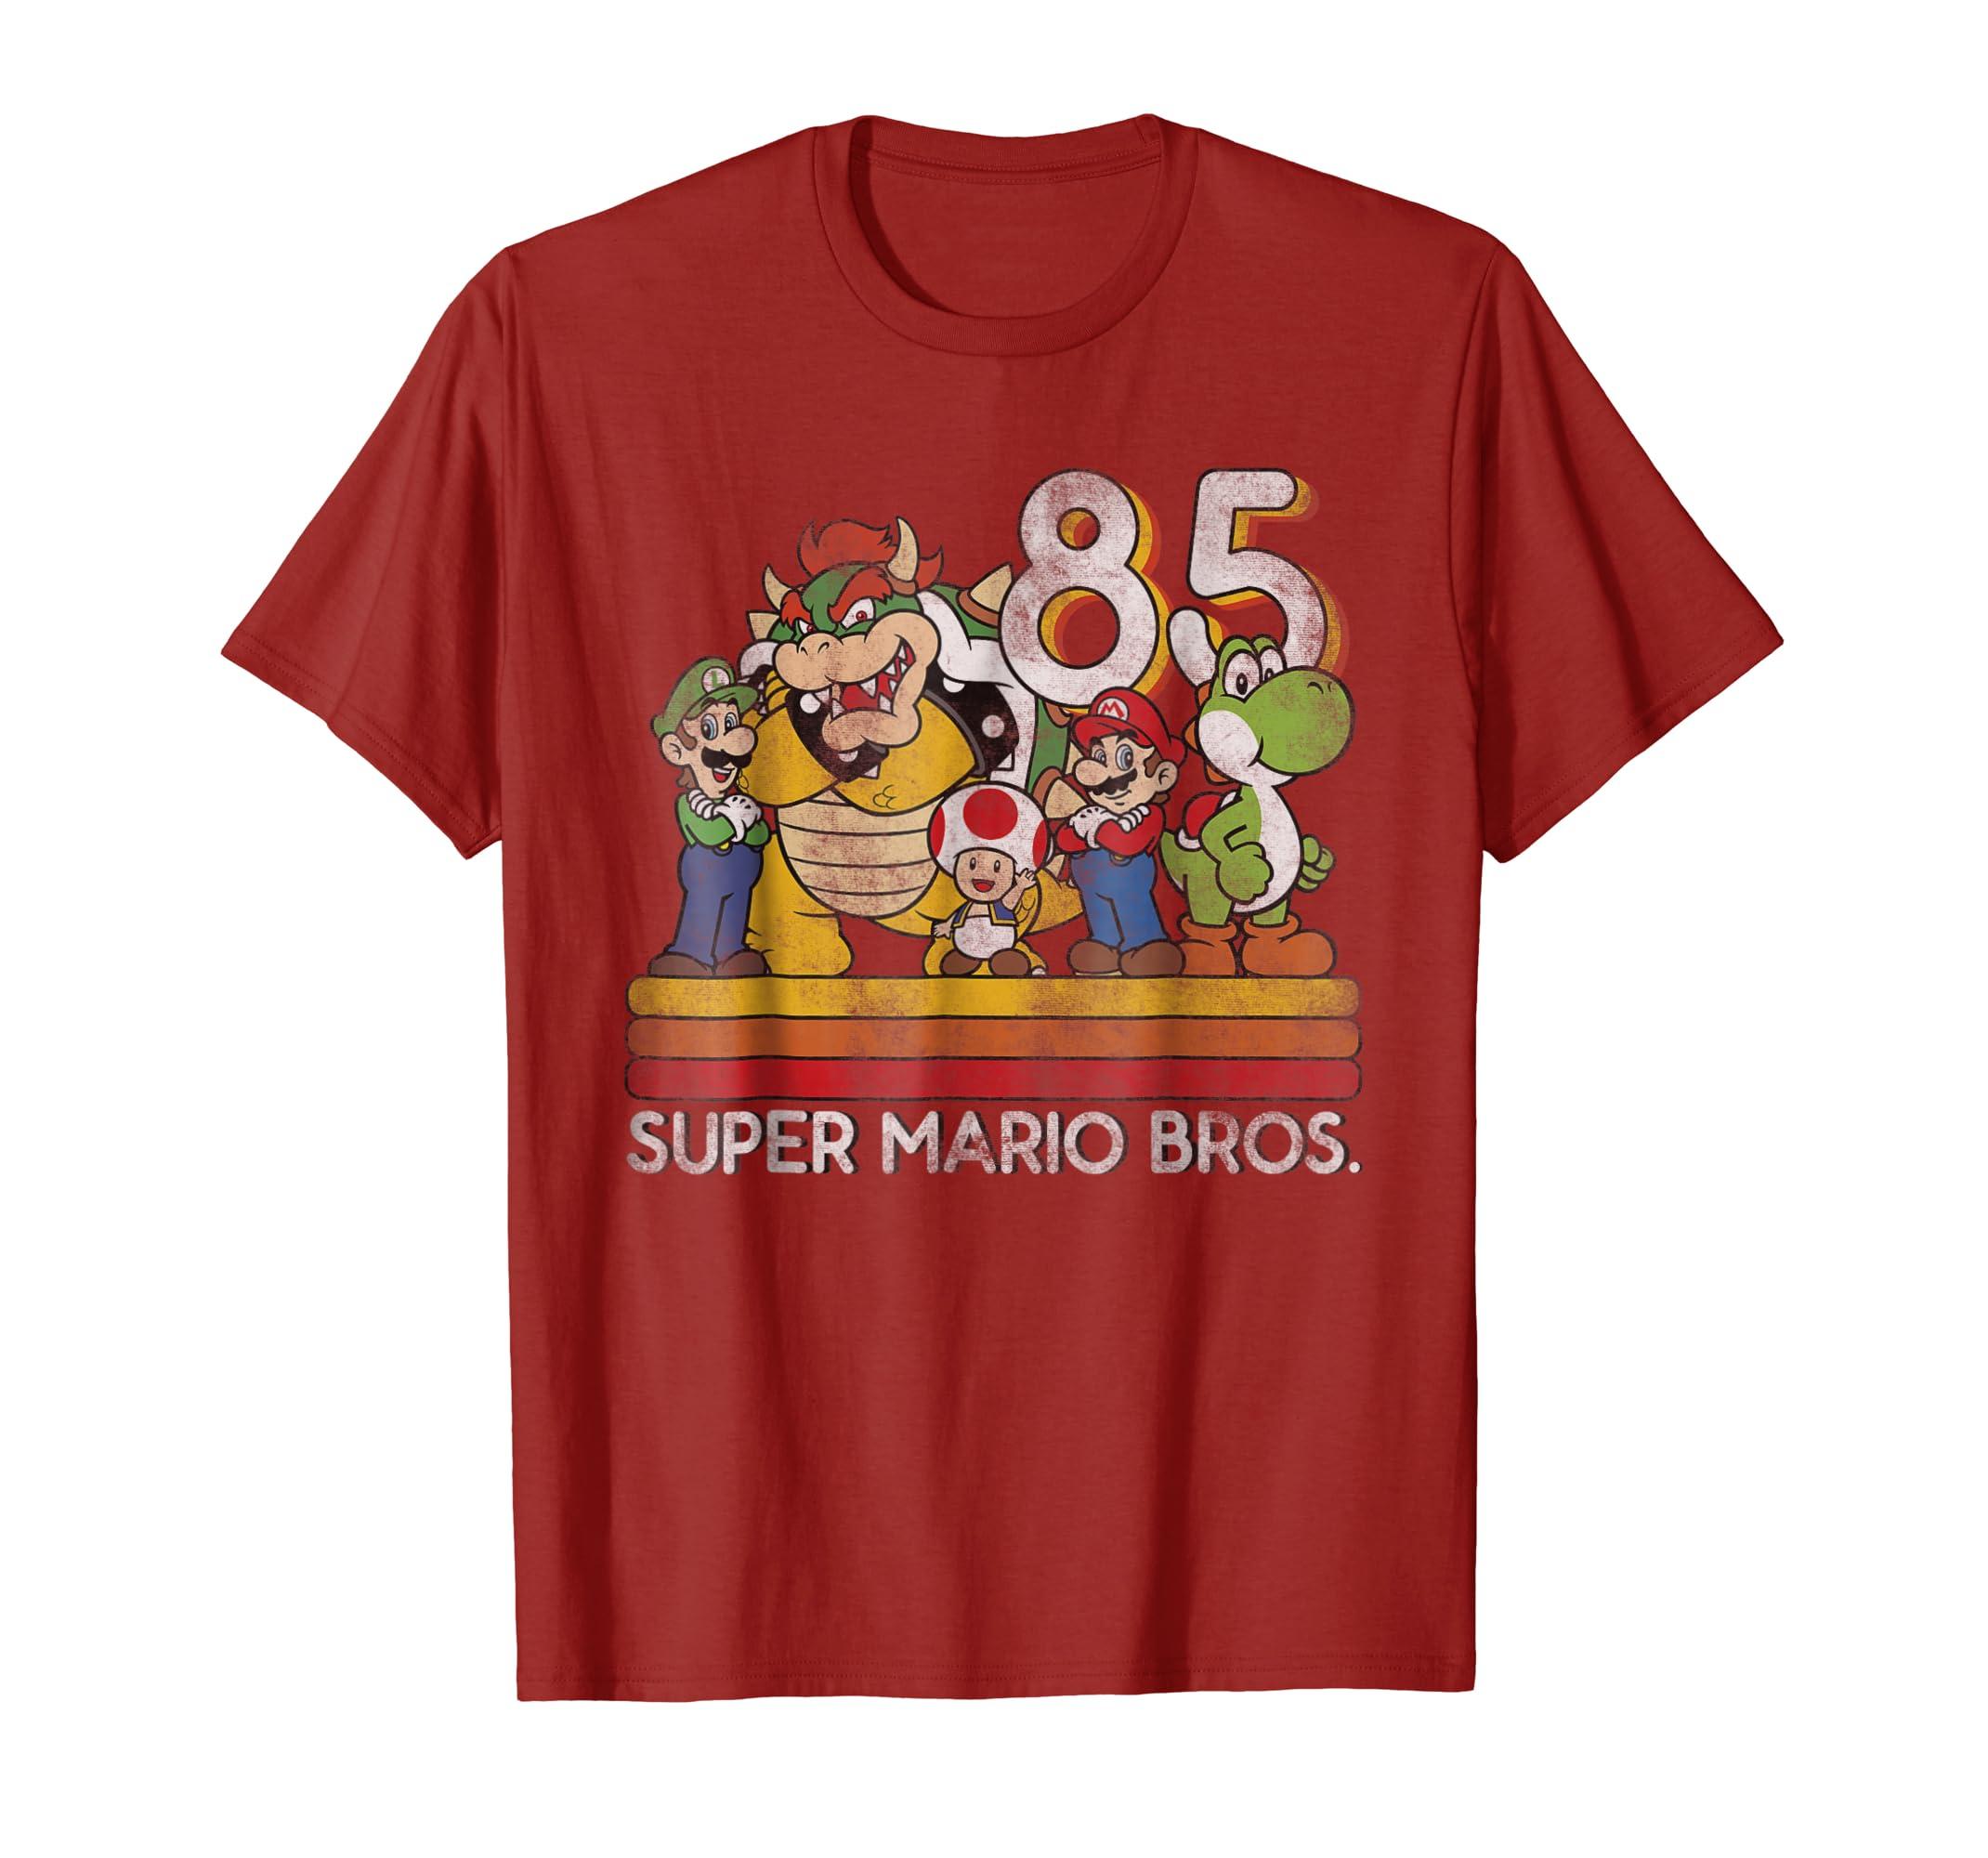 d8bf03bbe3 Amazon.com: Nintendo Super Mario Retro Character Line-Up Graphic T-Shirt:  Clothing